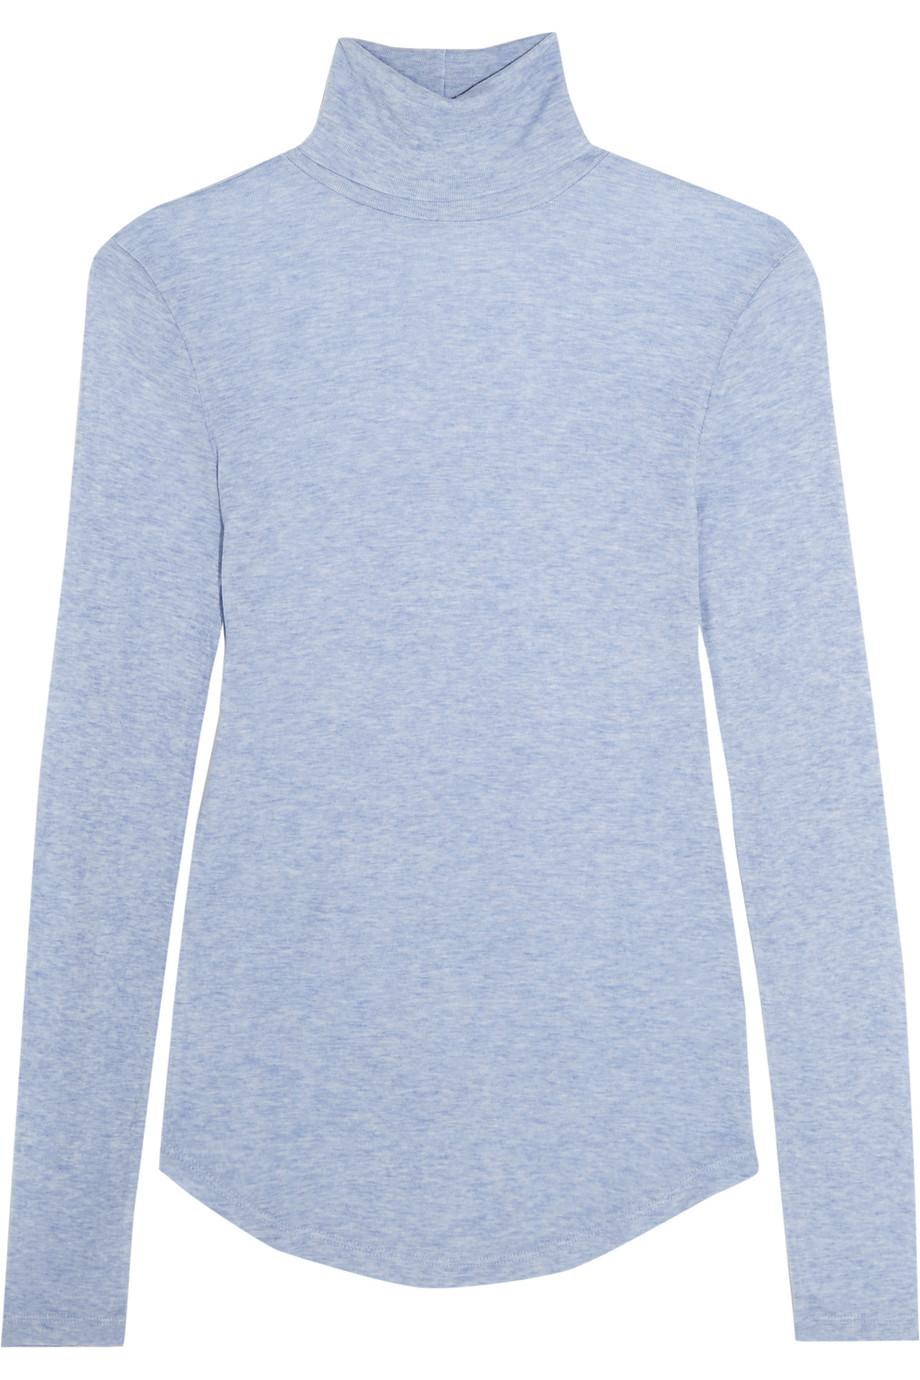 J.Crew Tencel and Cashmere-Blend Turtleneck Sweater, Light Blue, Women's, Size: XL